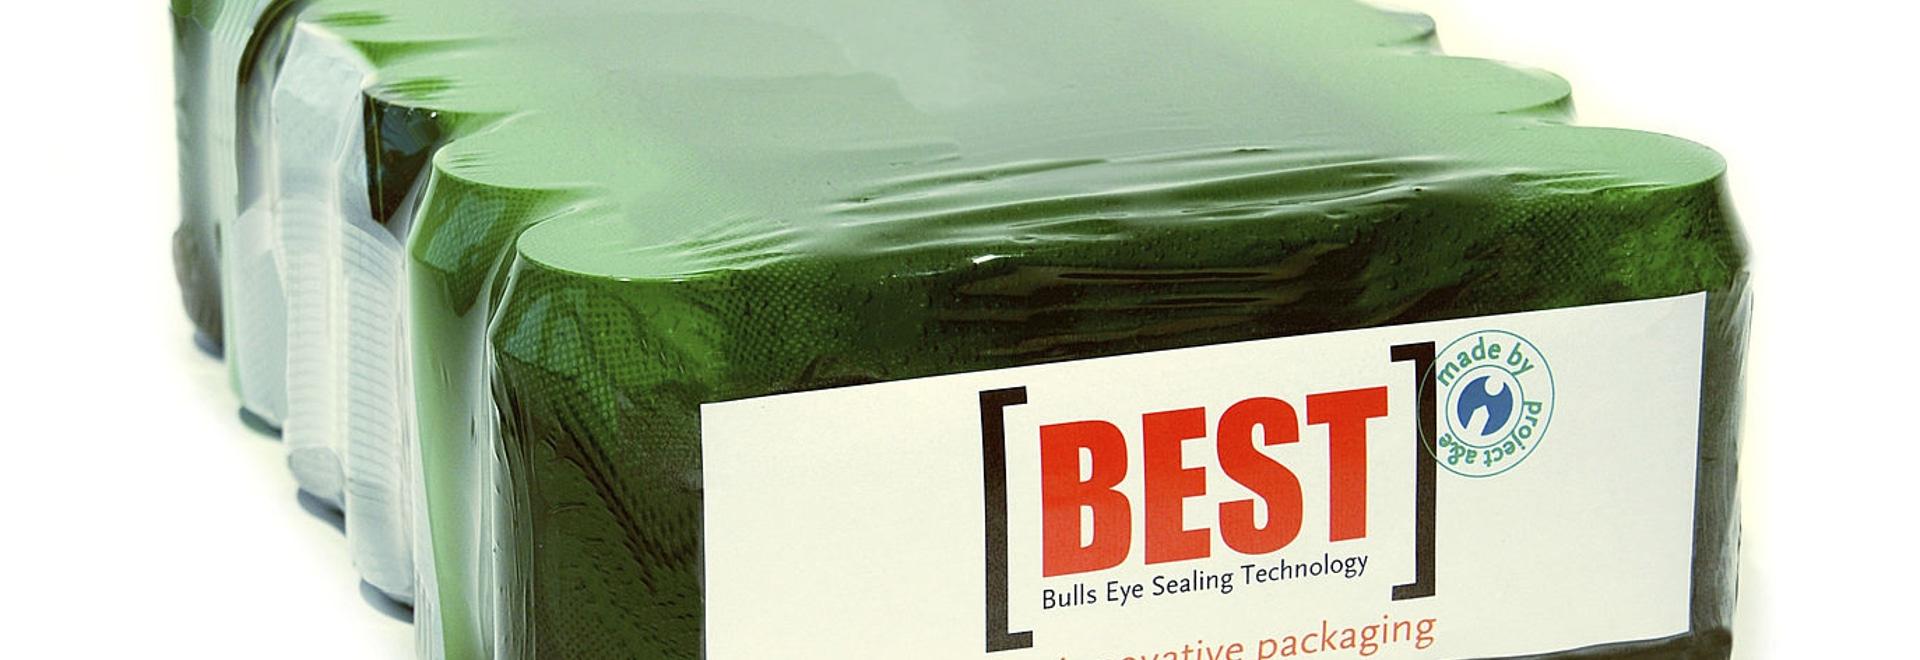 BESTechnology (Boudine-Cachetage-Technologie)